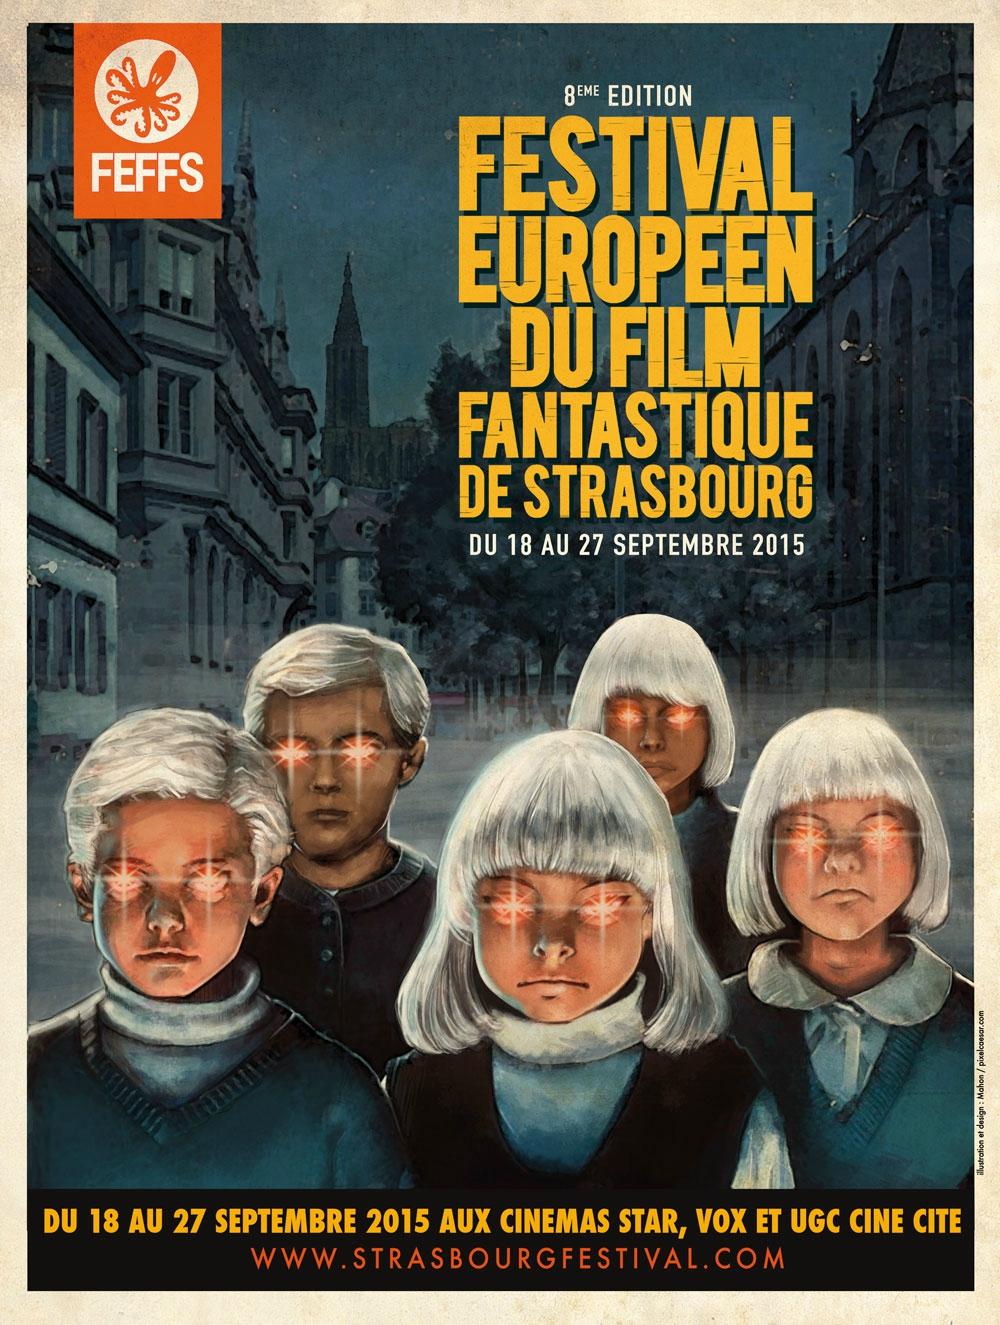 Festival Européen du Film Fantastique de Strasbourg 2015